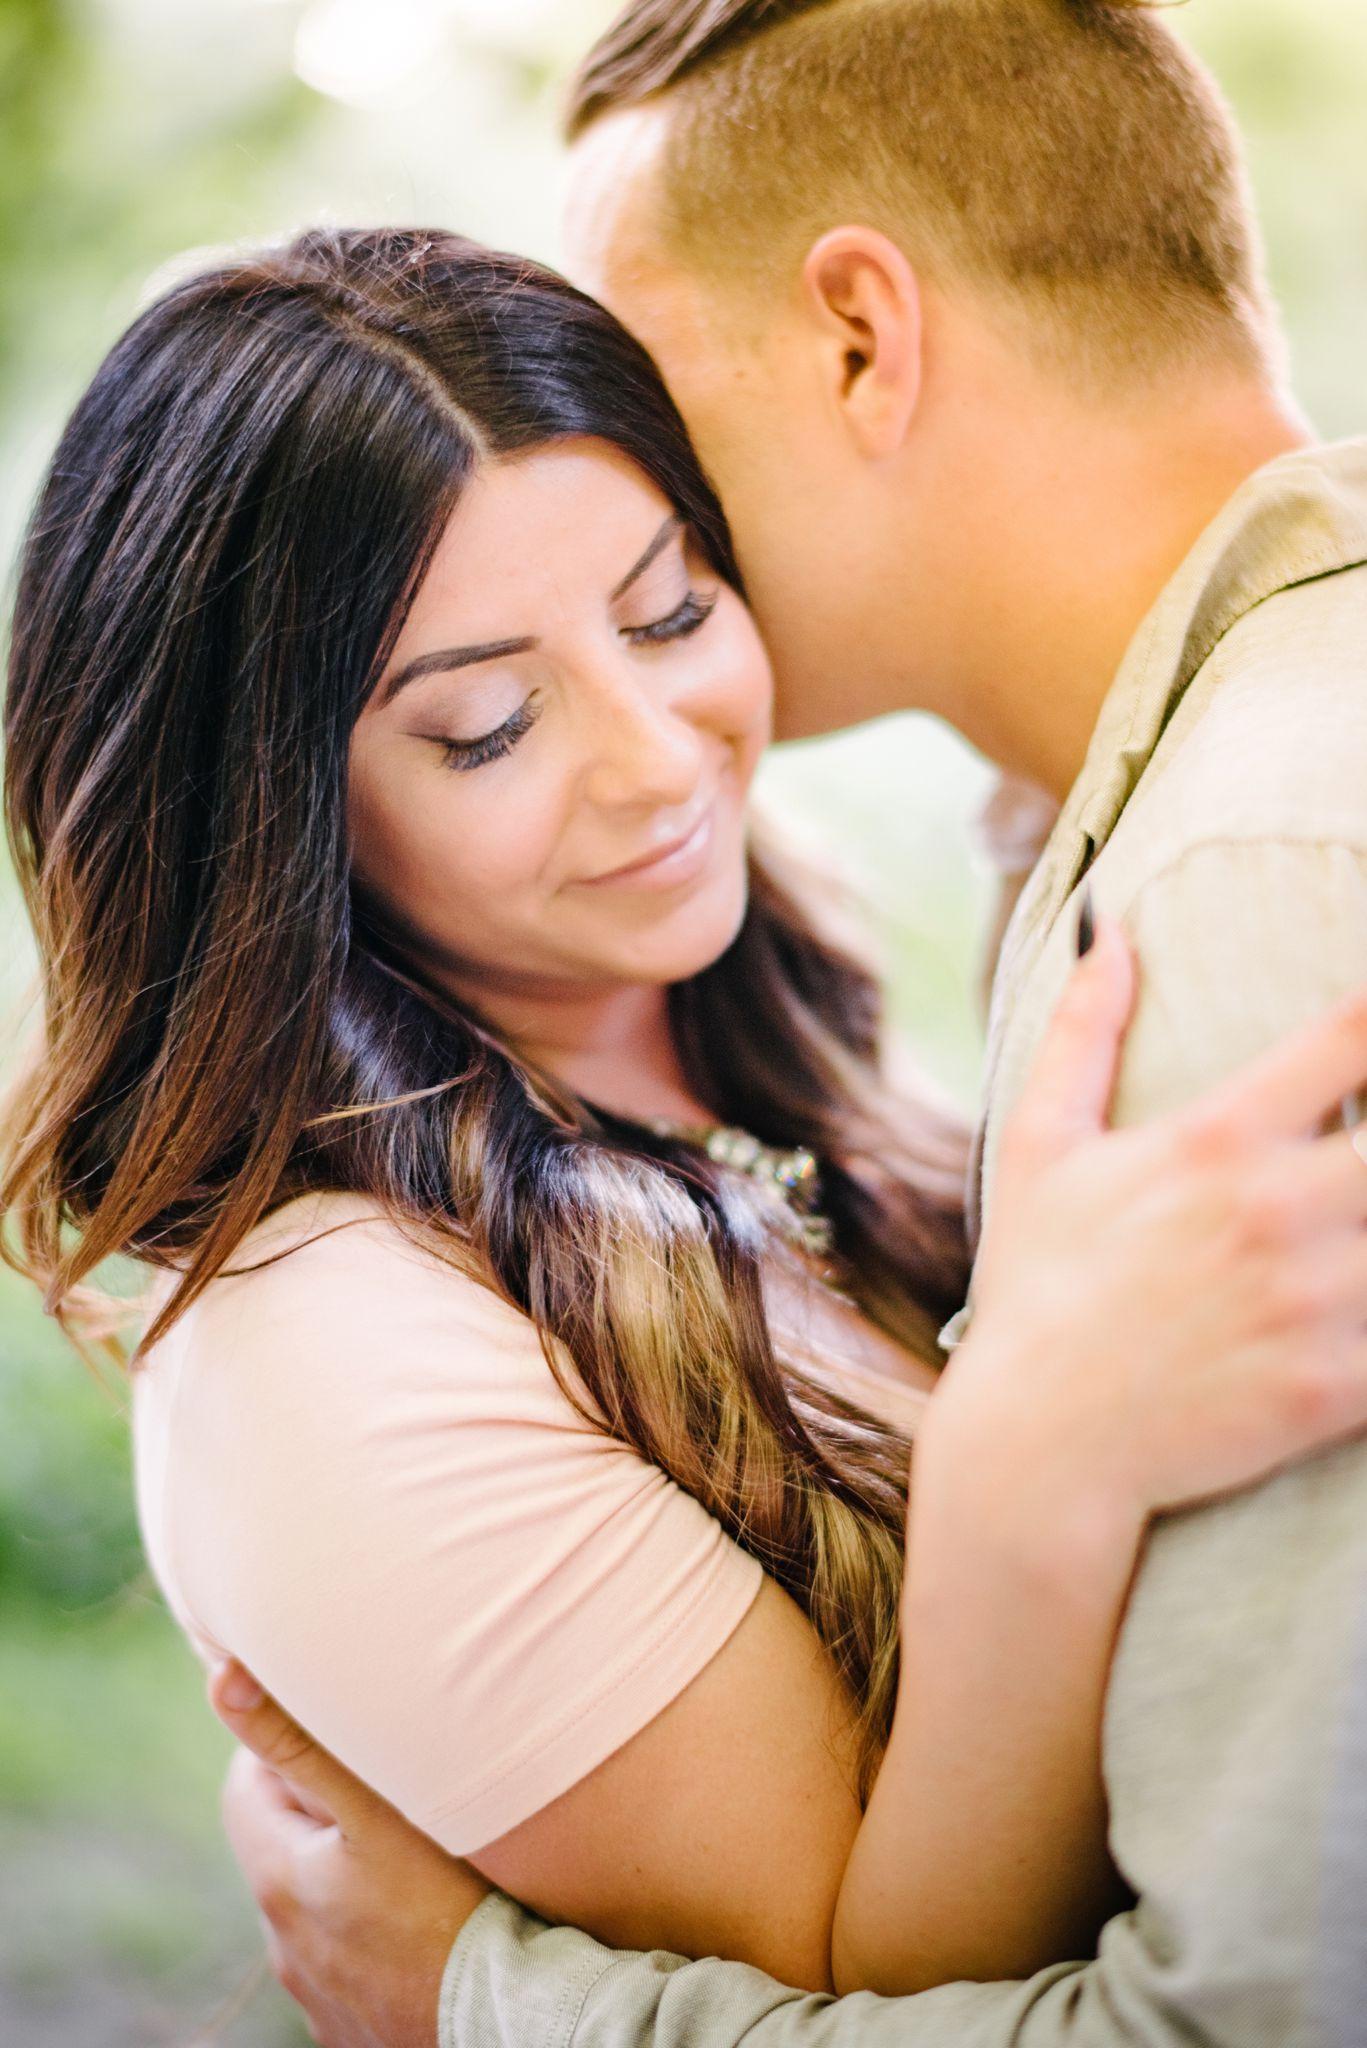 Schenley Park Engagement Pittsburgh Rachel Rossetti Photography_0045.jpg